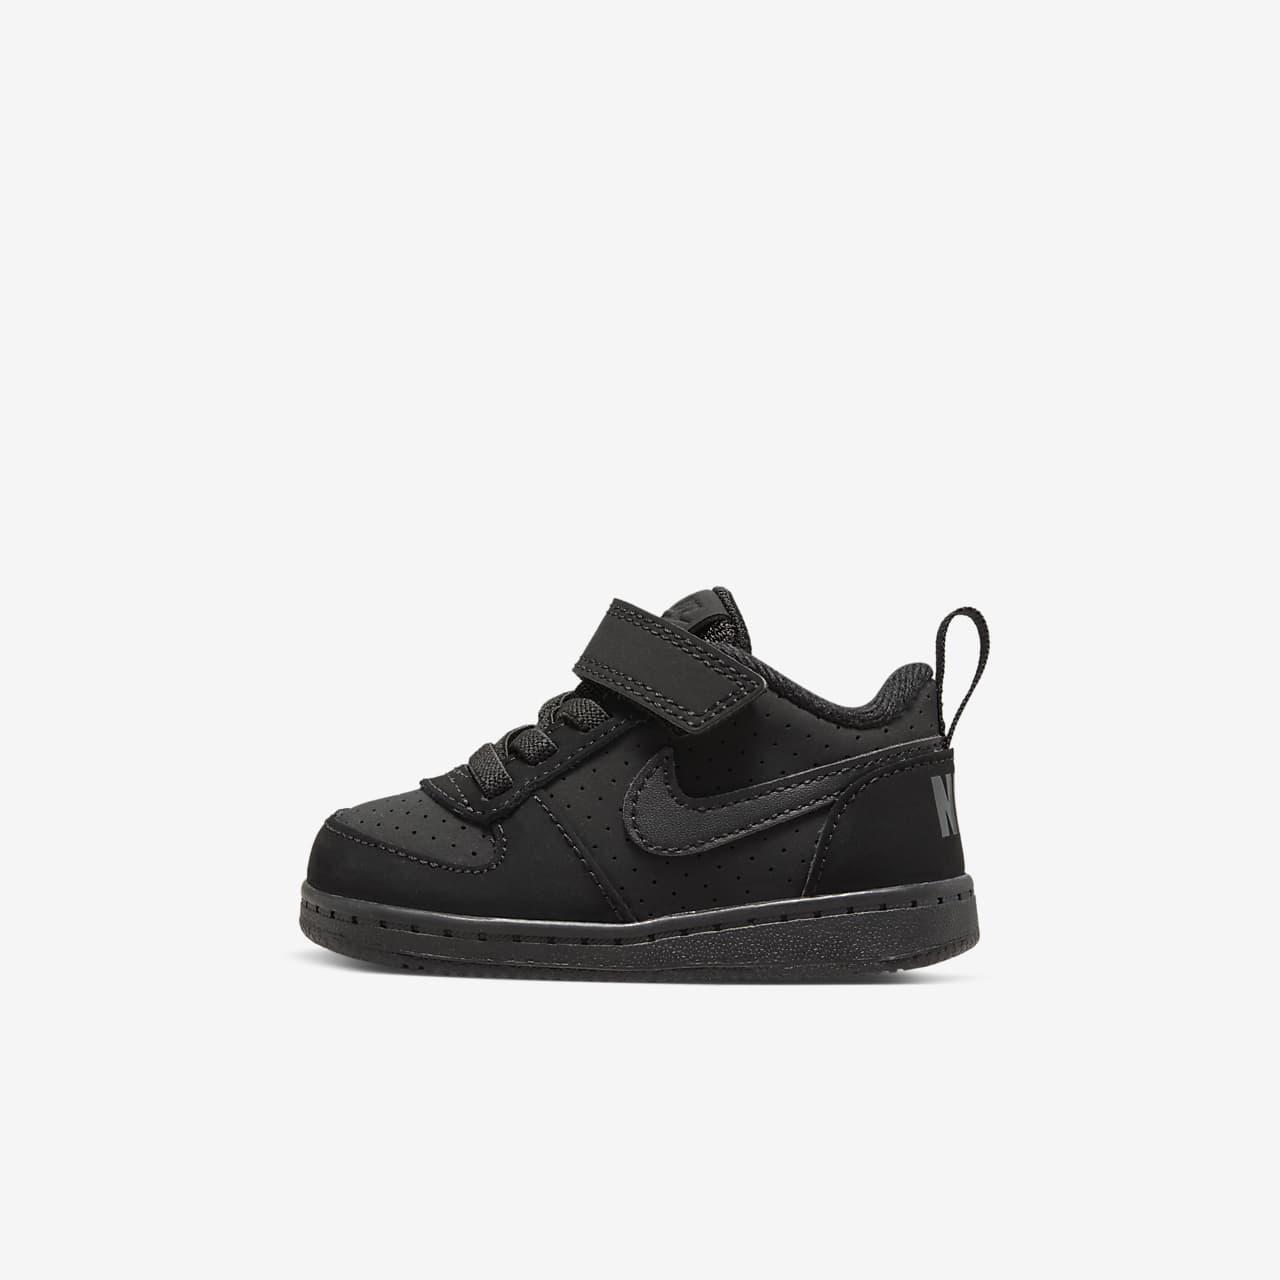 NikeCourt Borough Low Schoen baby's/peuters